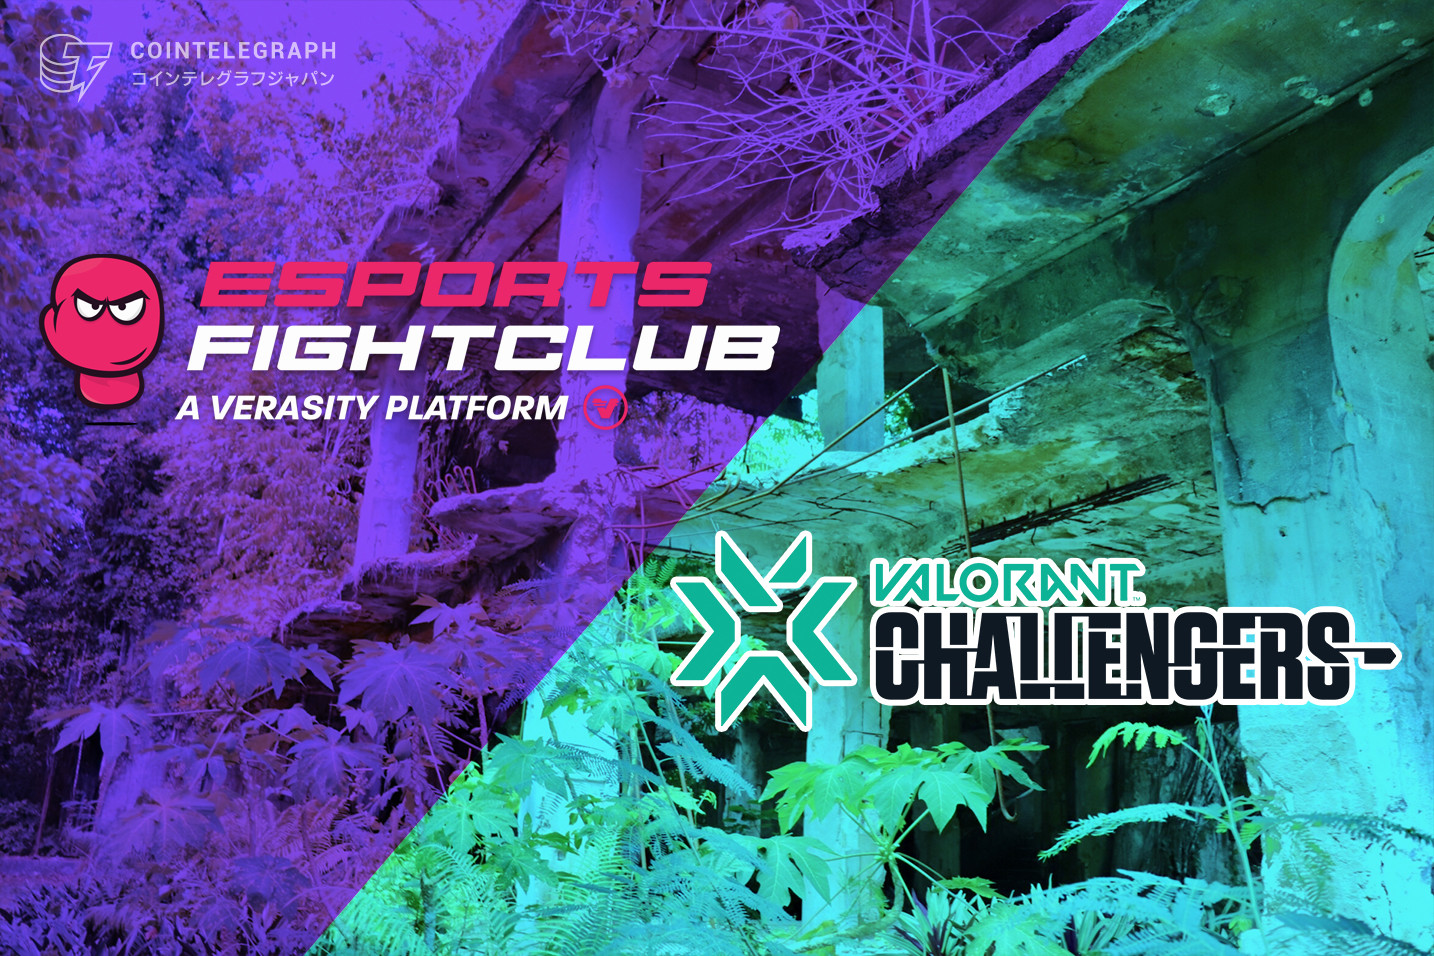 Verasityの「Eスポーツファイトクラブ」が東南アジアで開催されるRiot Gameの2021 VALORANTチャンピオンツアーと提携、最高のゲーミングエクスペリエンスを提供